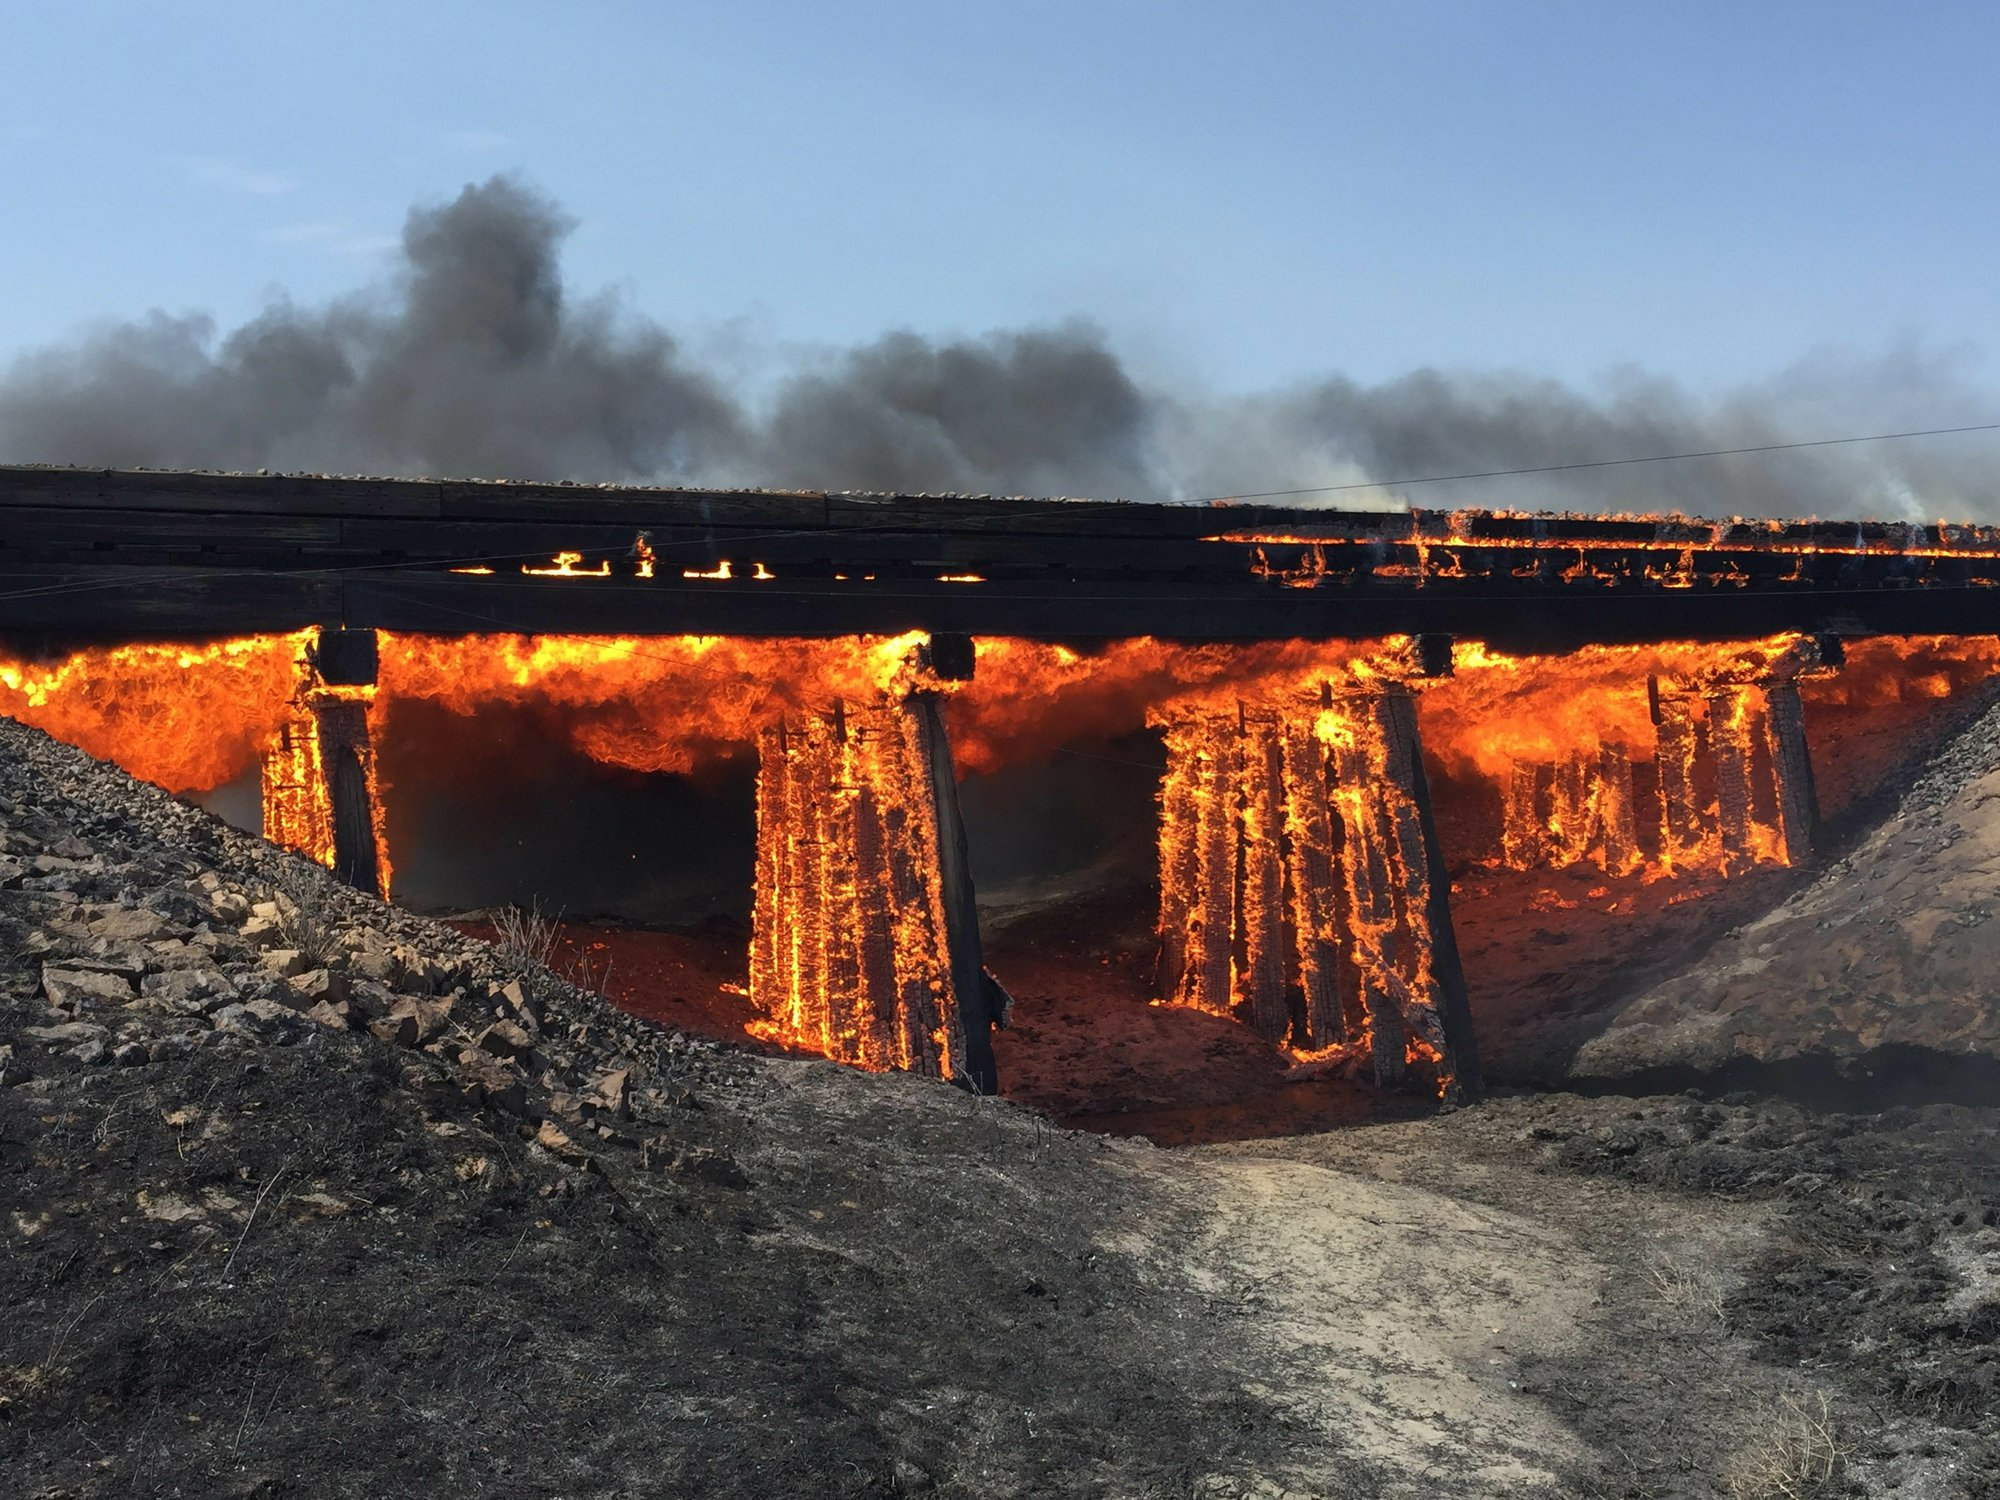 Western wildfires still rage, but some progress being made